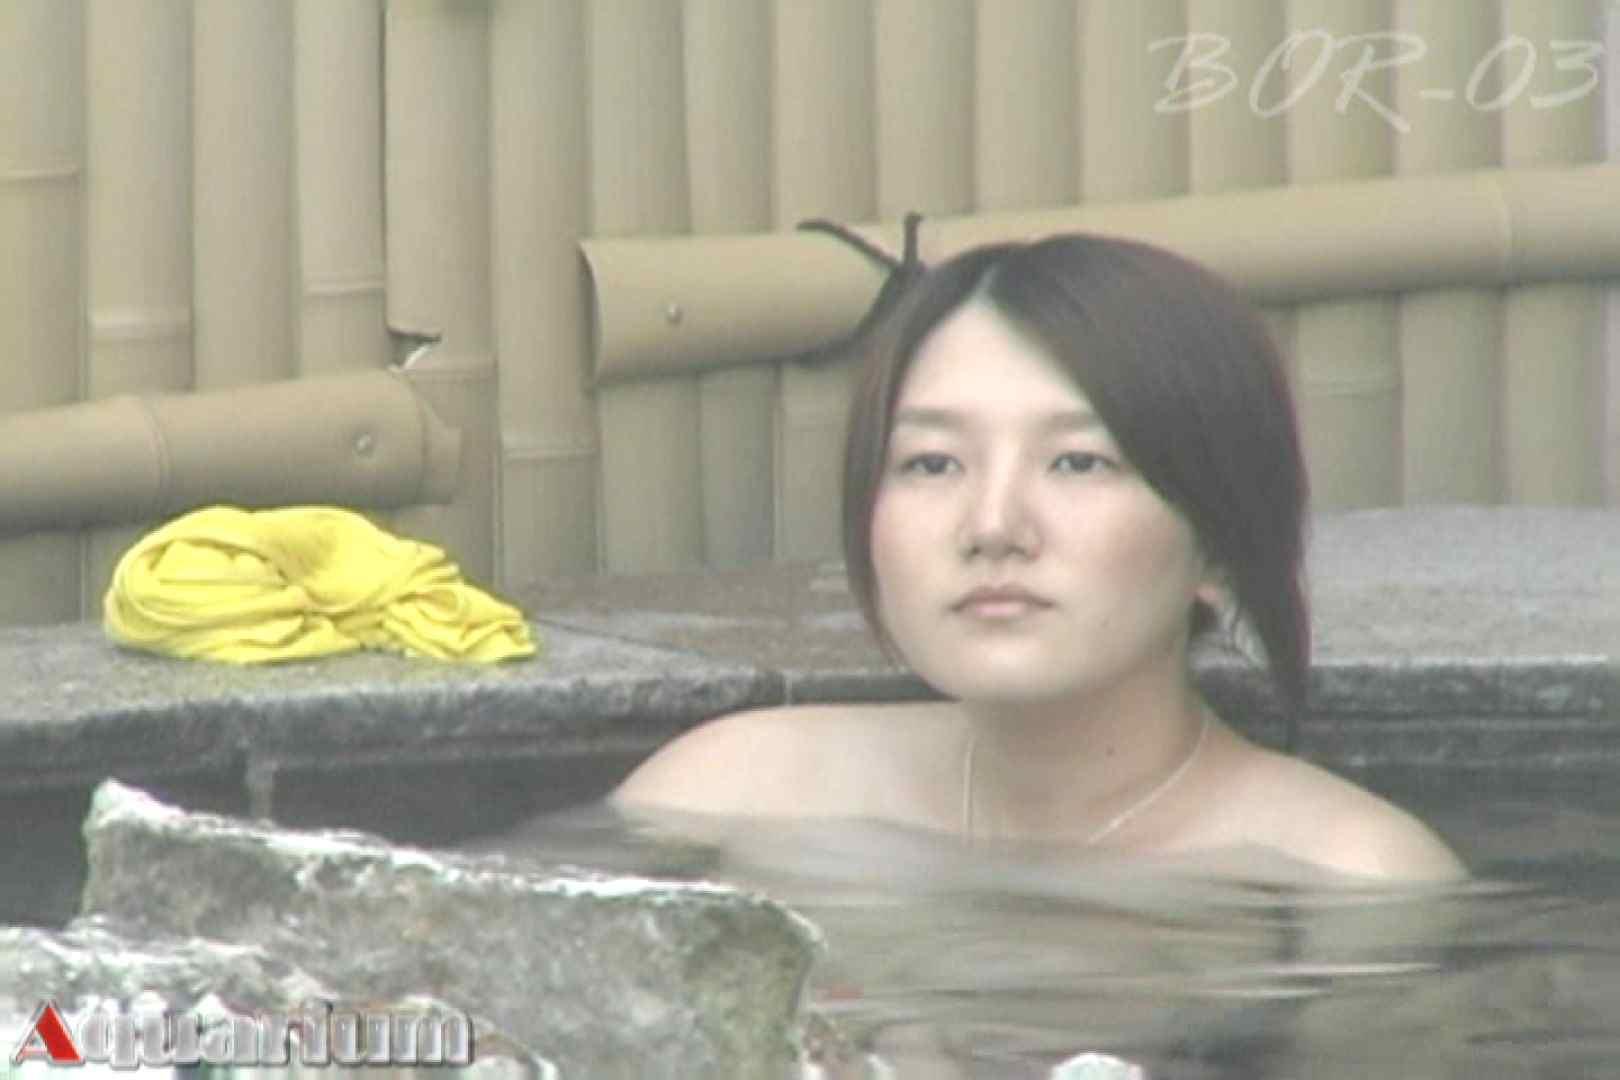 Aquaな露天風呂Vol.487 盗撮 おめこ無修正画像 95連発 53